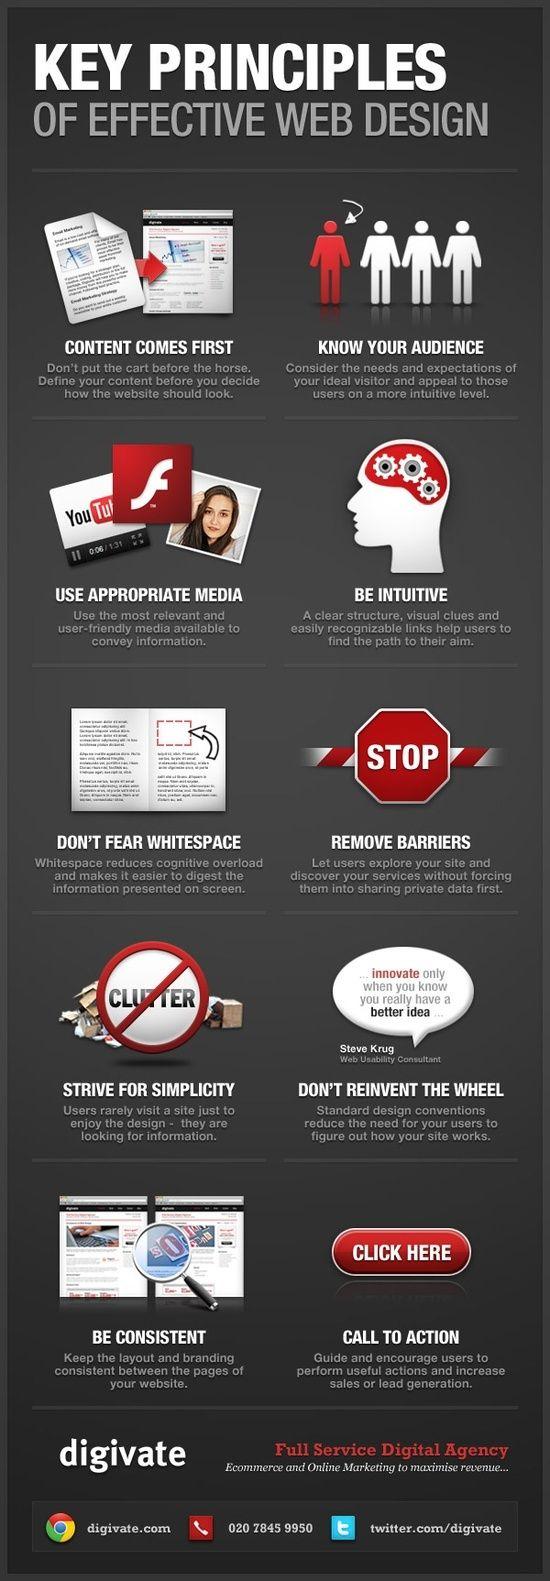 #Infographic - Key Principles of Effective Web Design